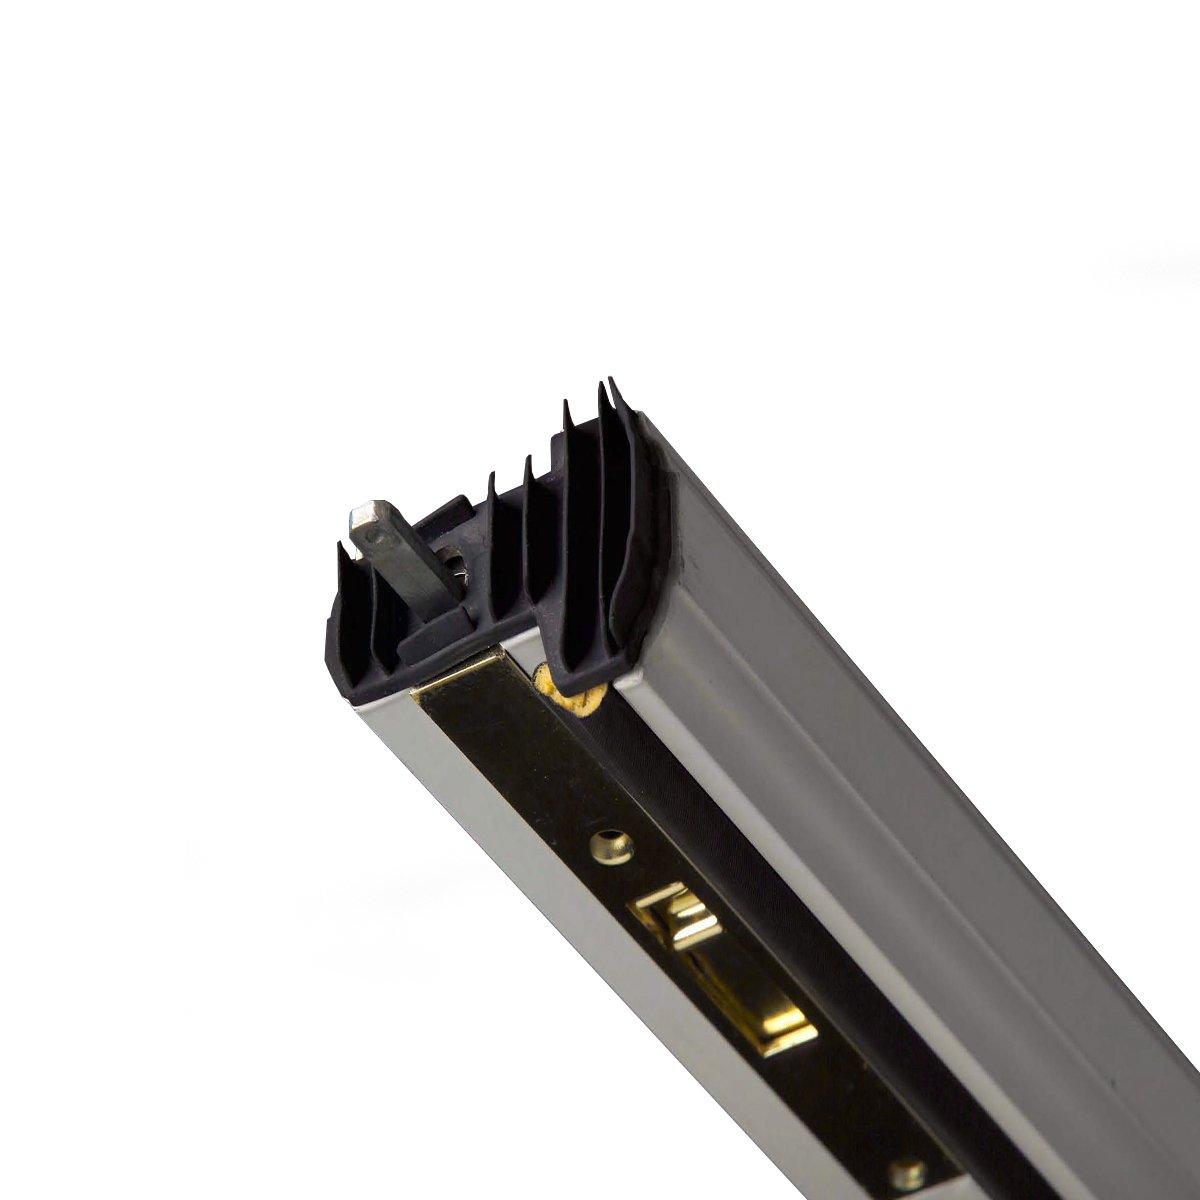 M-D Building Products 01560 WS059 Aluminum Locking Slide Bolt Combination Astragal